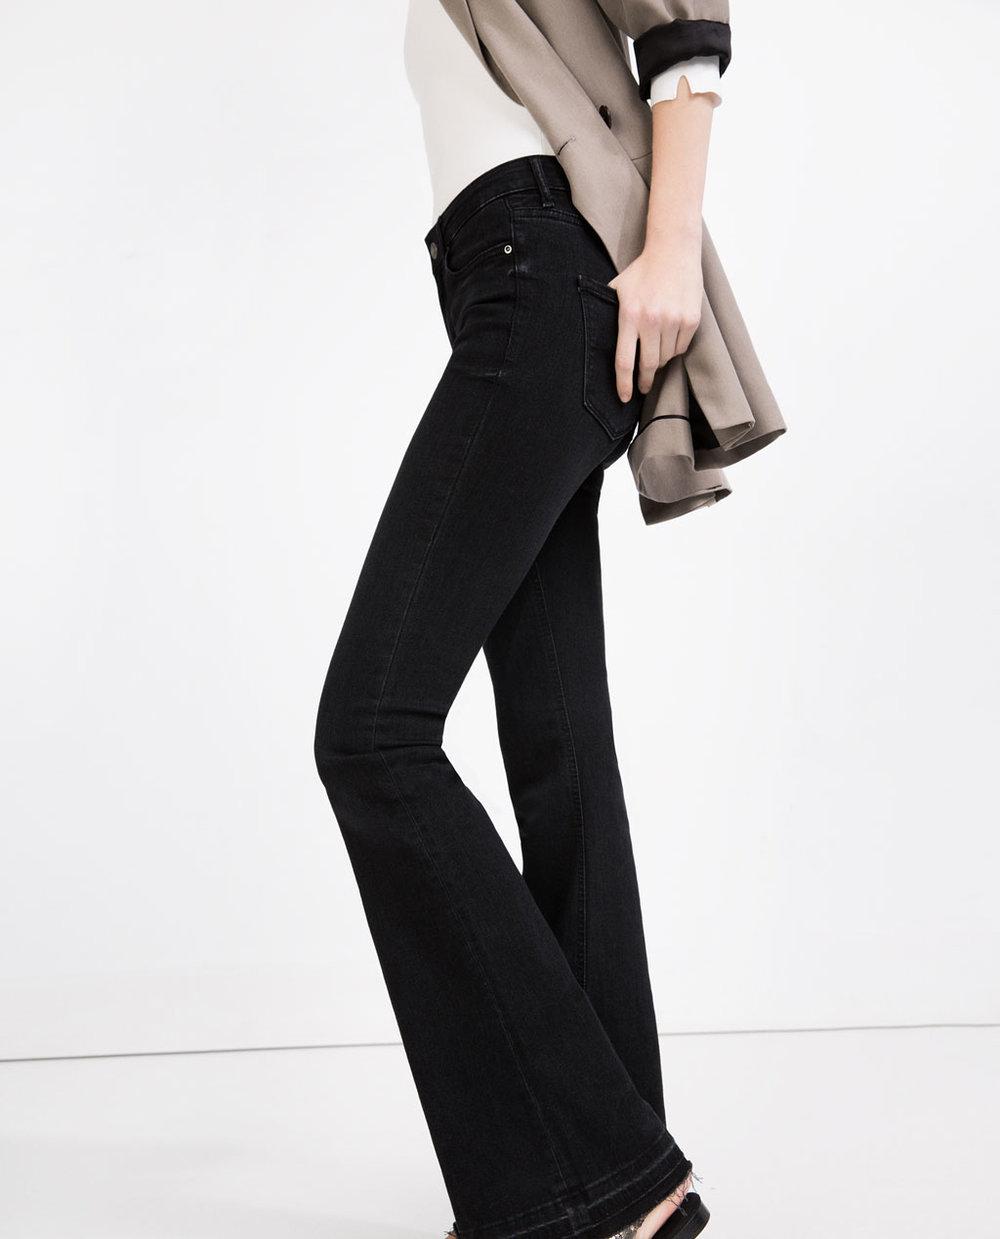 Zara-The-Flare.jpg